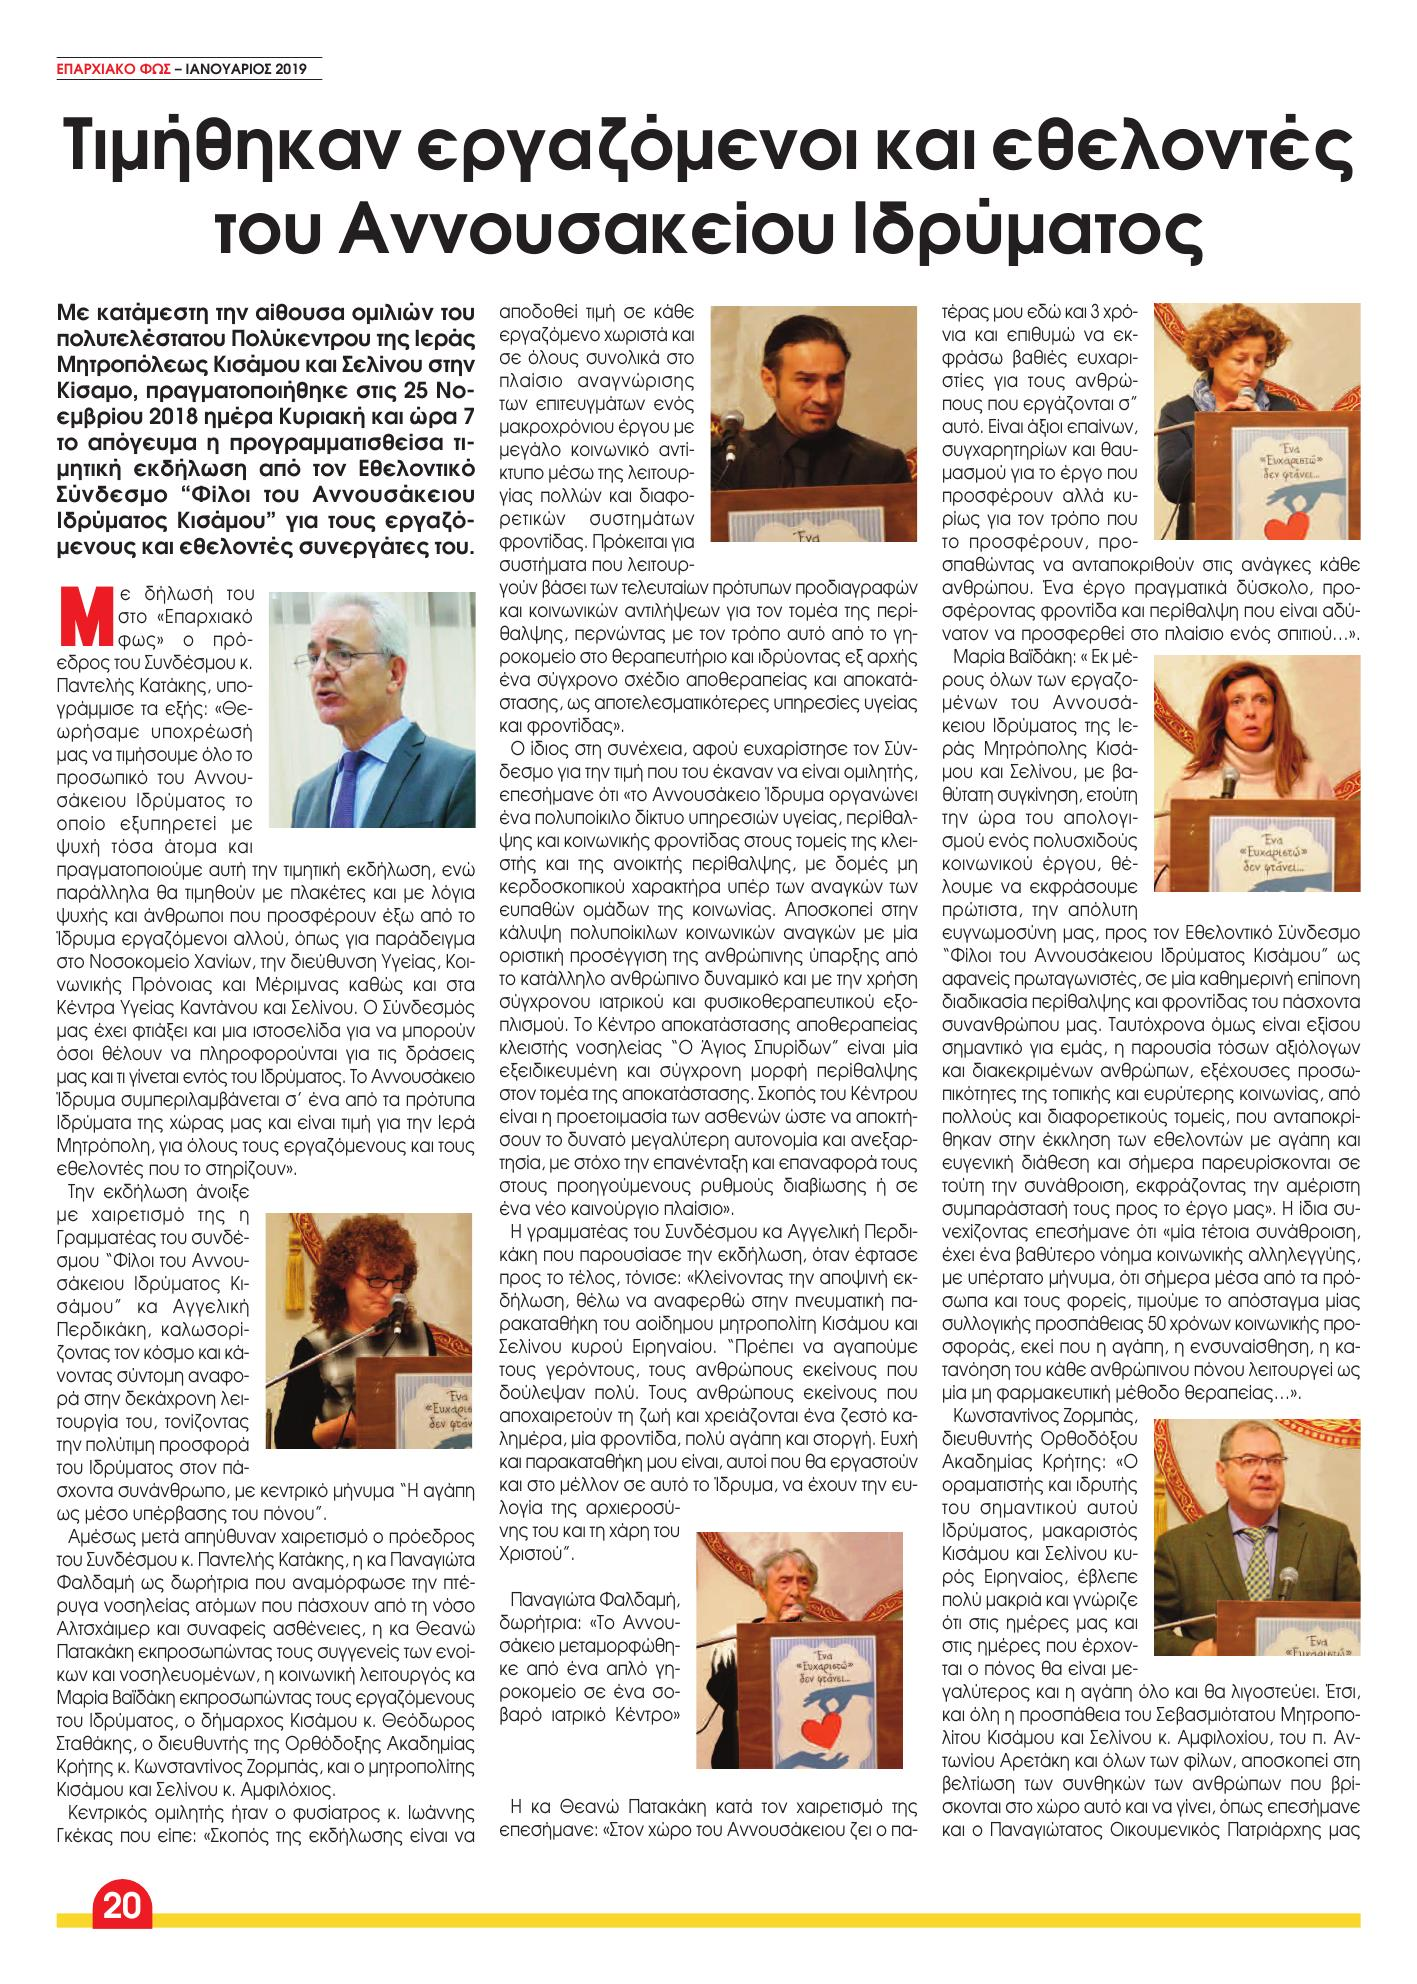 23 KAKANOULHS (Page 20)